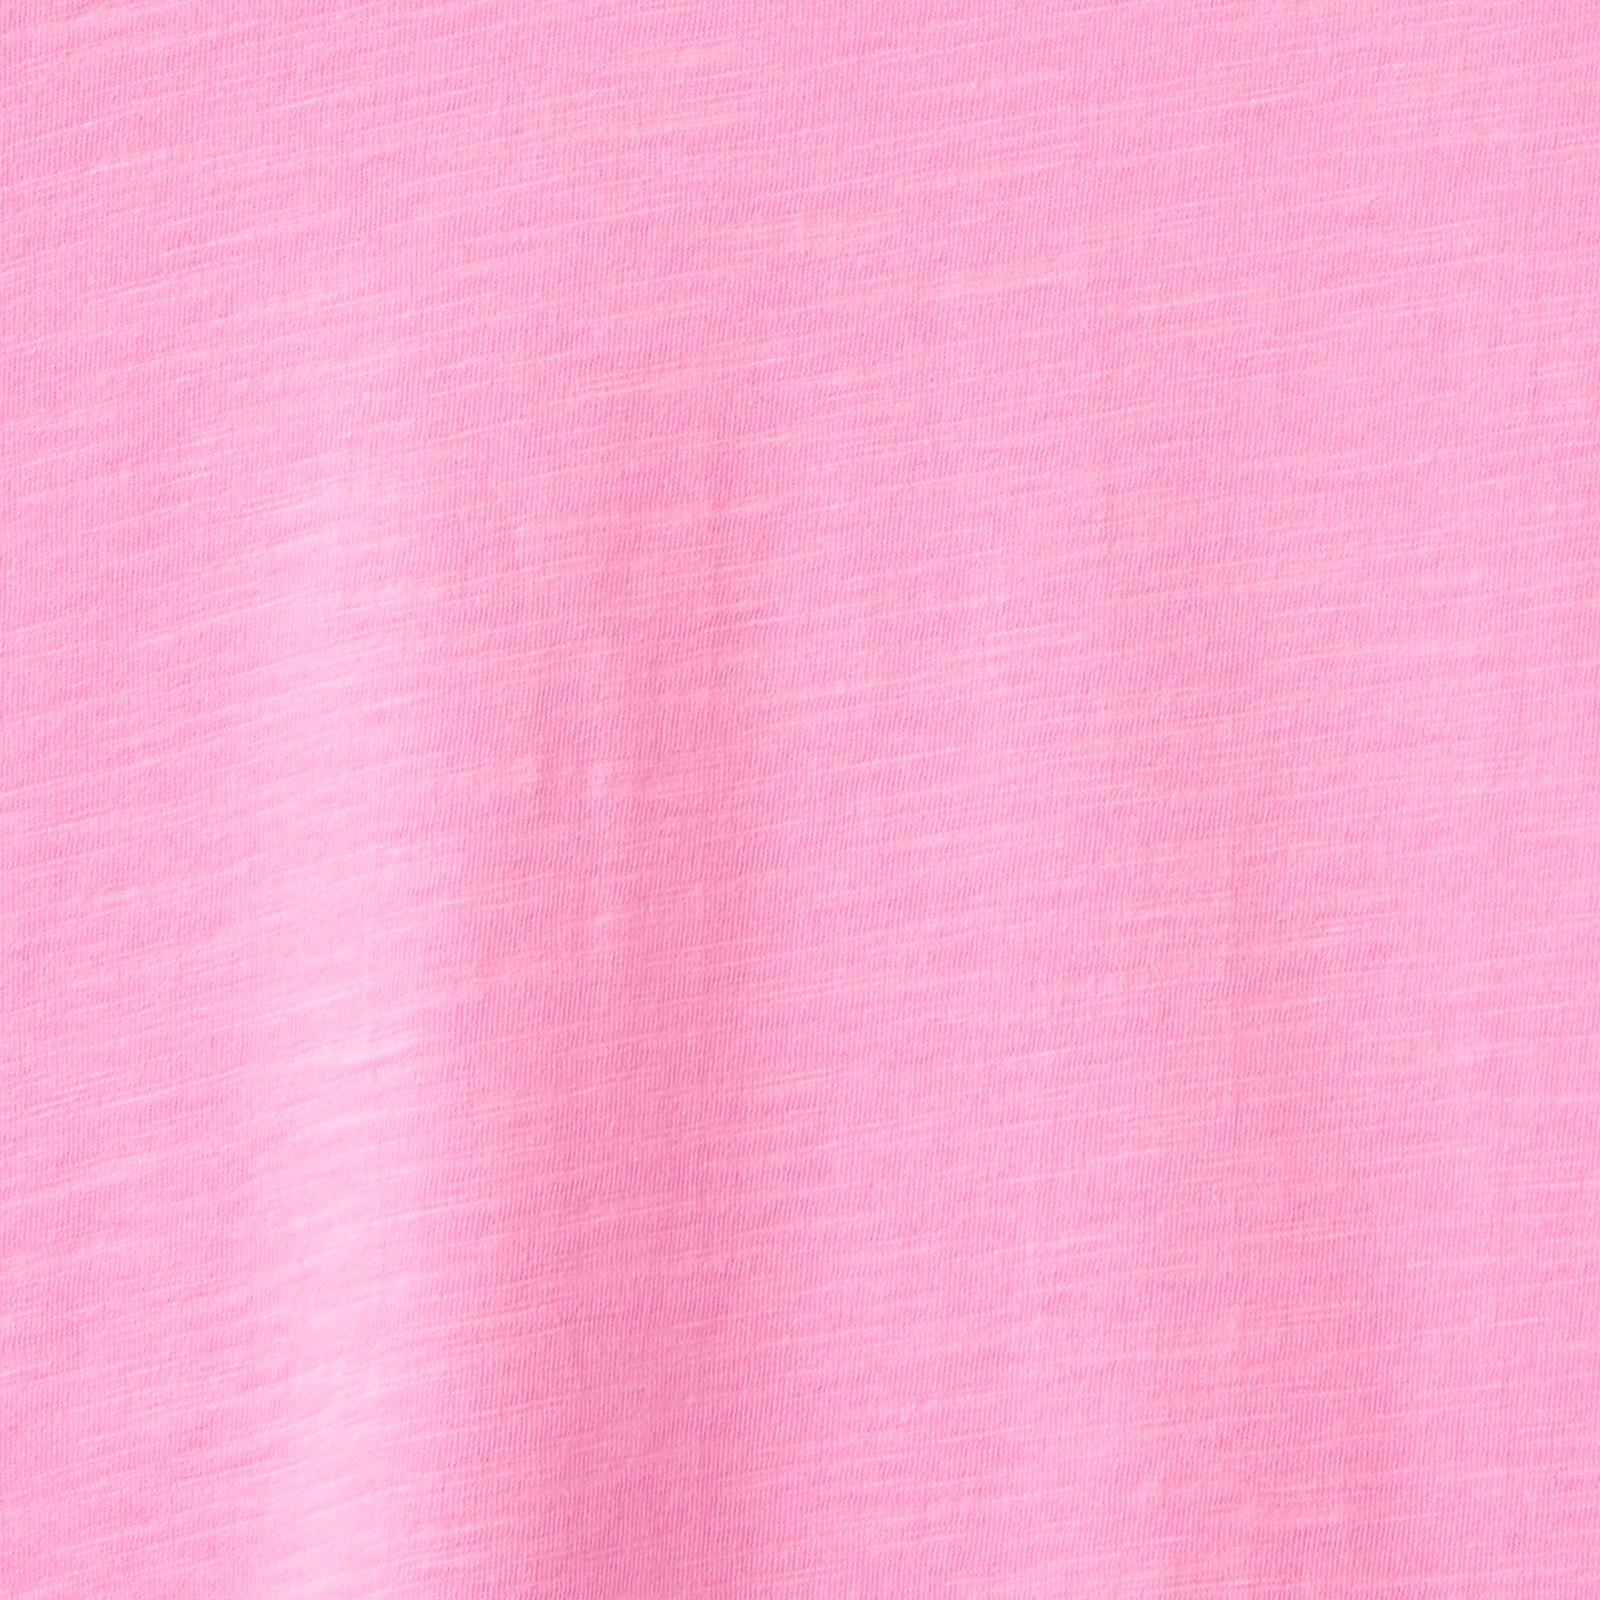 Joules-Nessa-Damas-Equitacion-Manga-corta-Jersey-Top-de-Moda-de-pais-Caminar miniatura 45